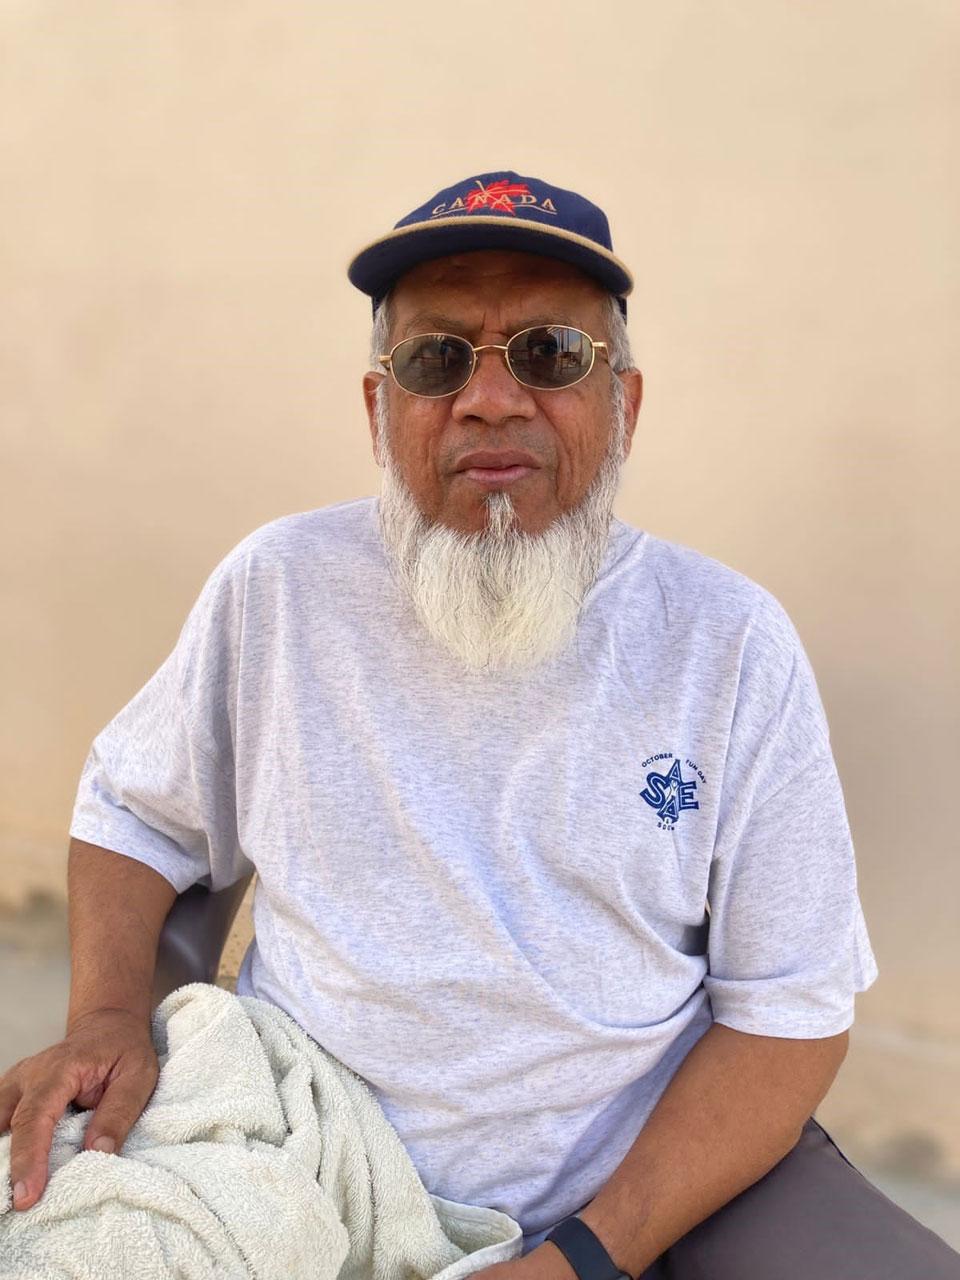 Engr. Iqbal Ahmed Khan at Ormara Resort waiting for his breakfast before leaving the area.